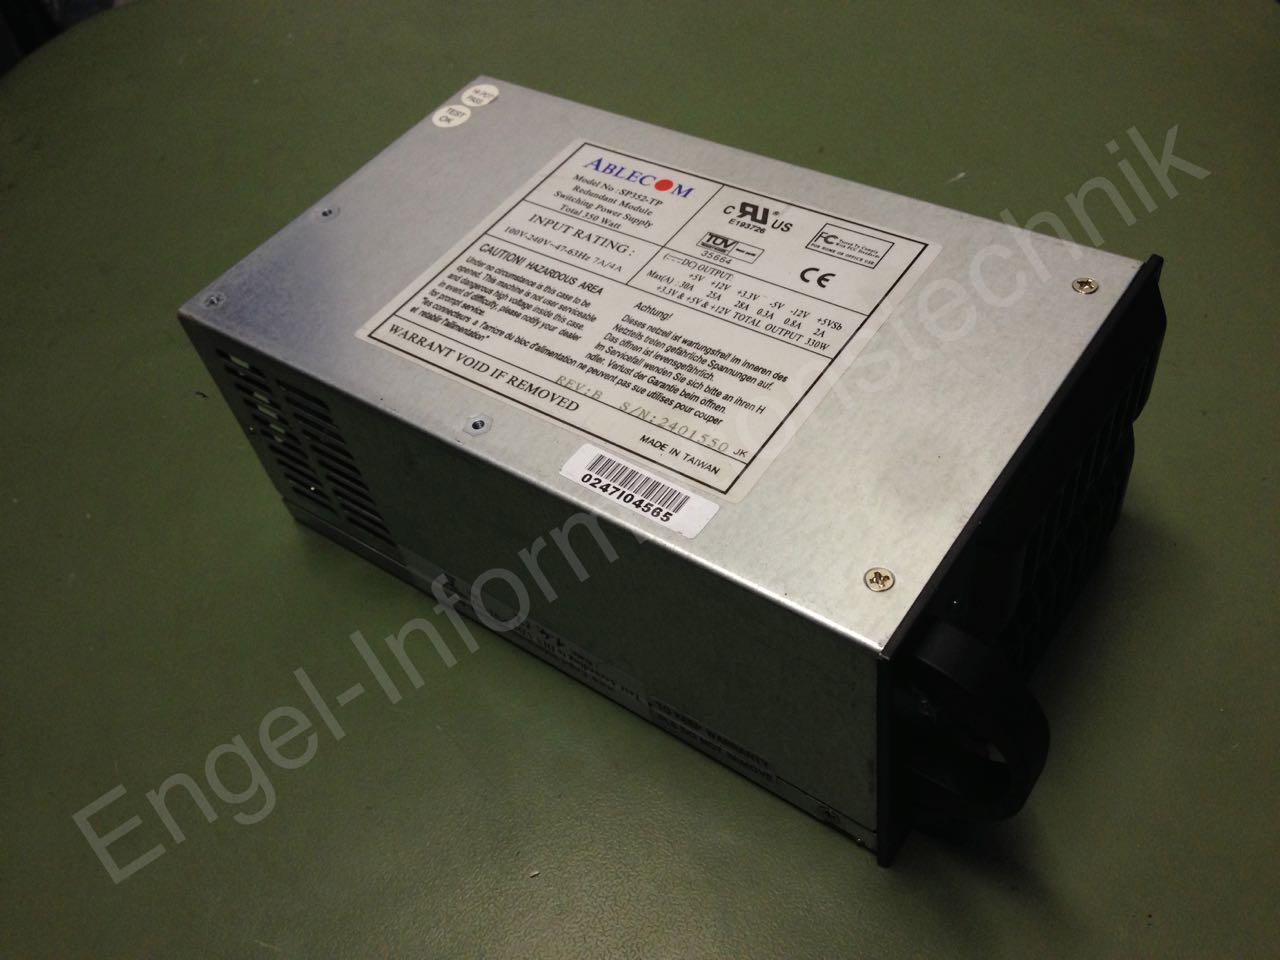 Ablecom SP352-TP